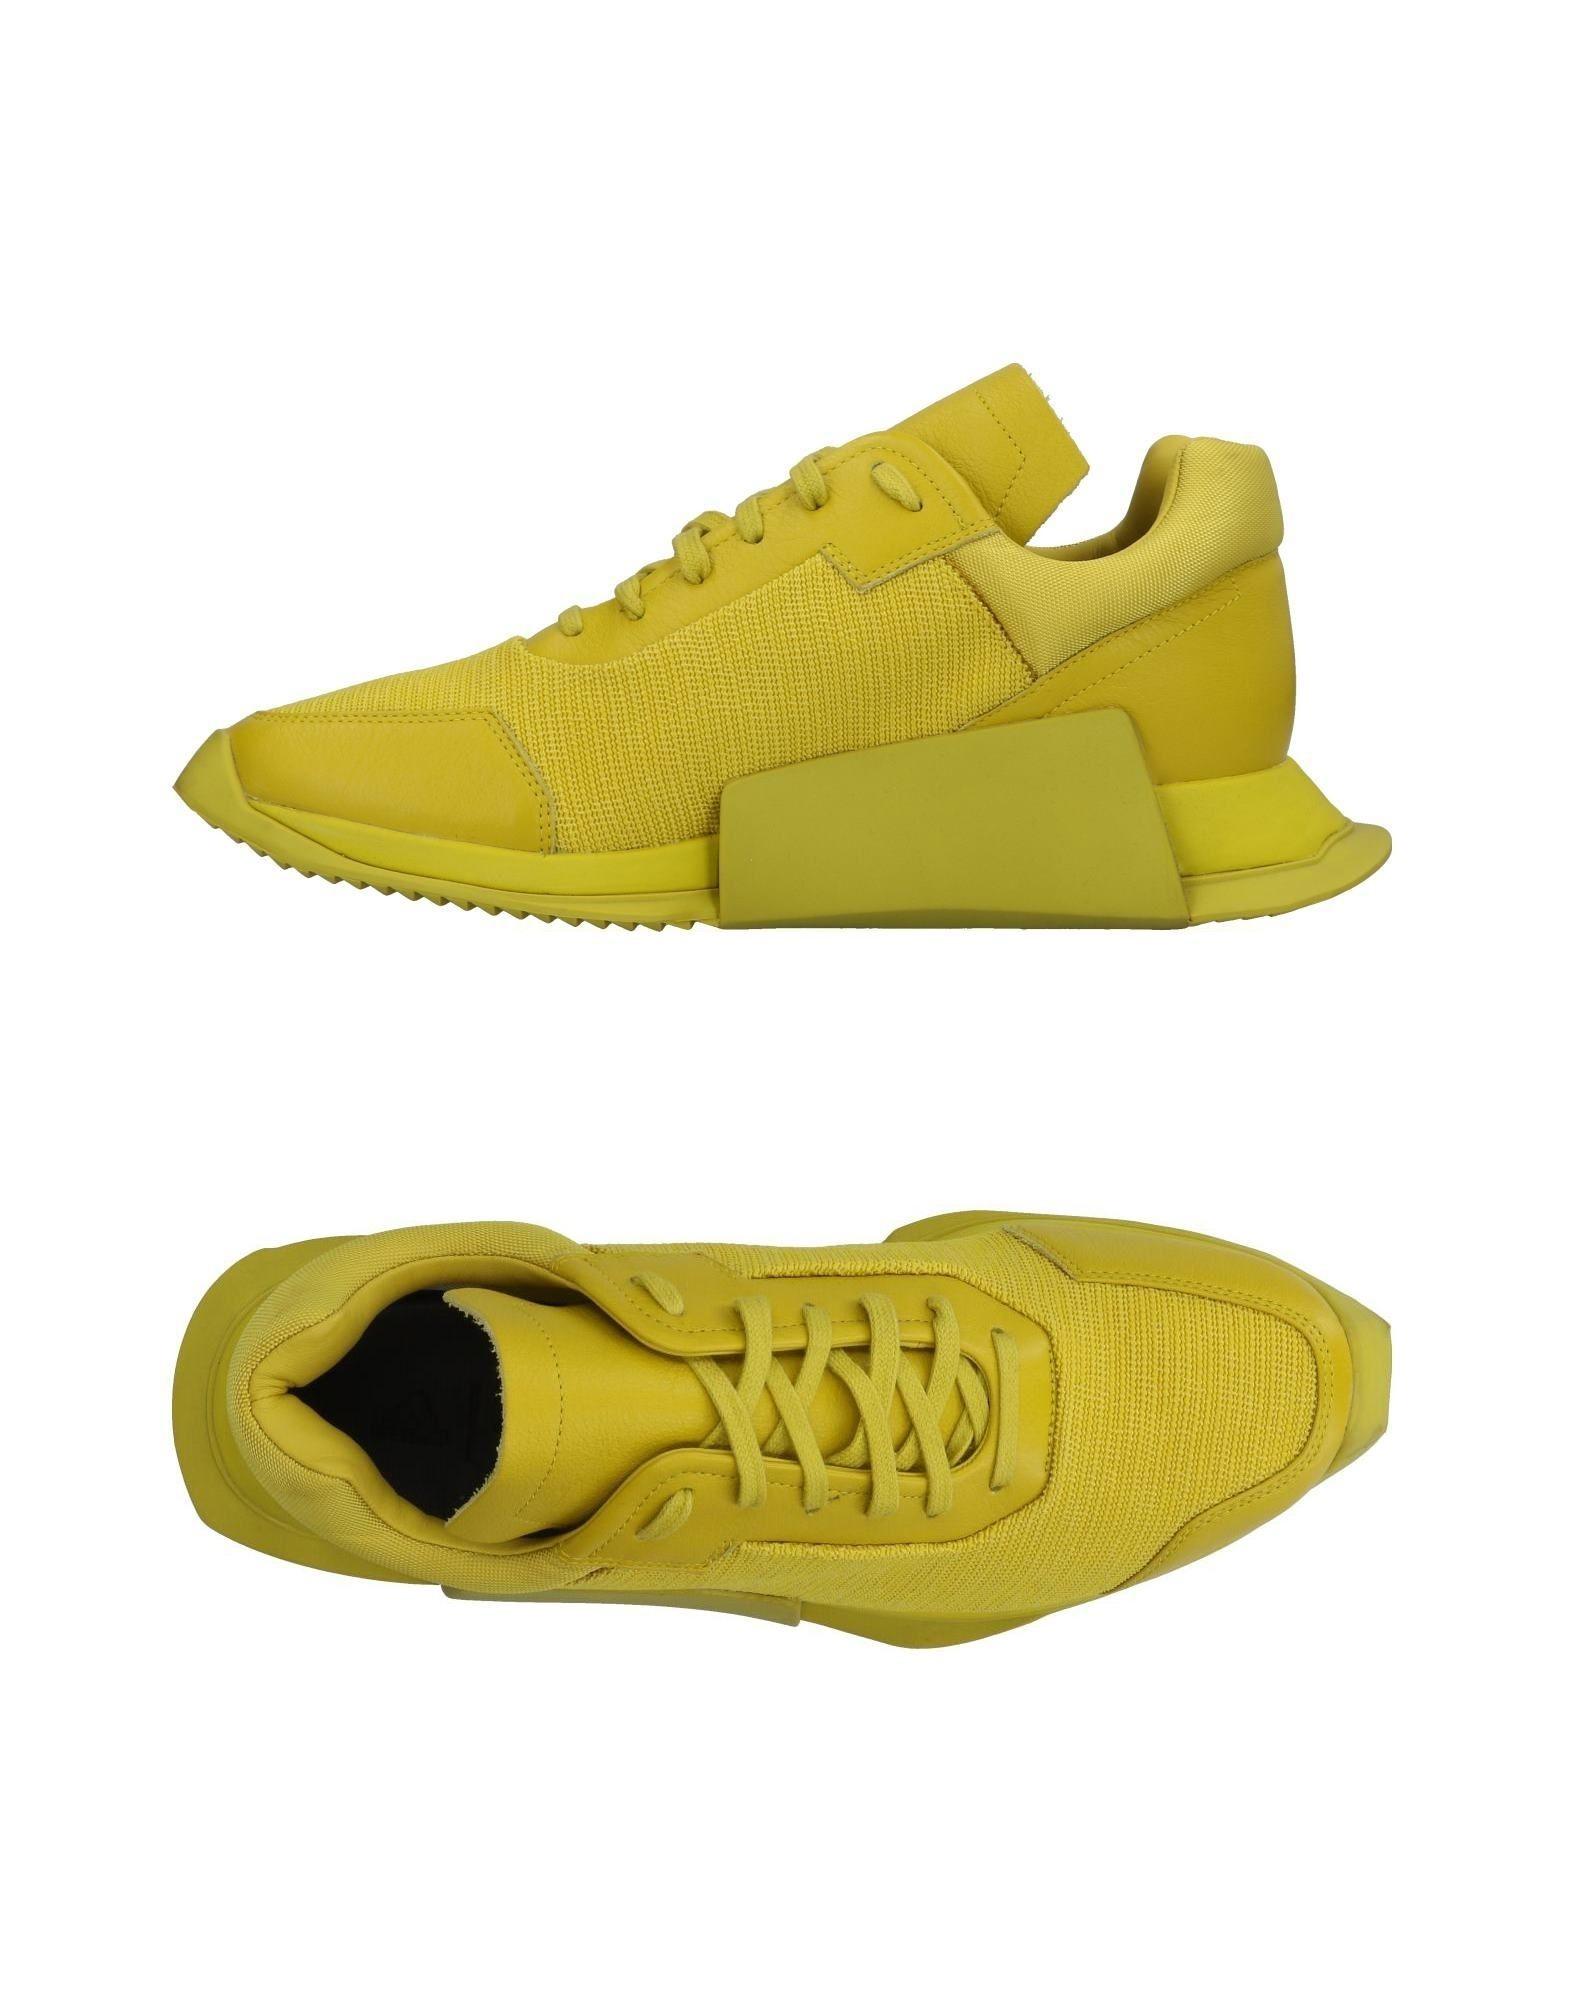 ADIDAS X RICK OWENS   RICK OWENS x ADIDAS Low-tops & sneakers 11431645   Goxip